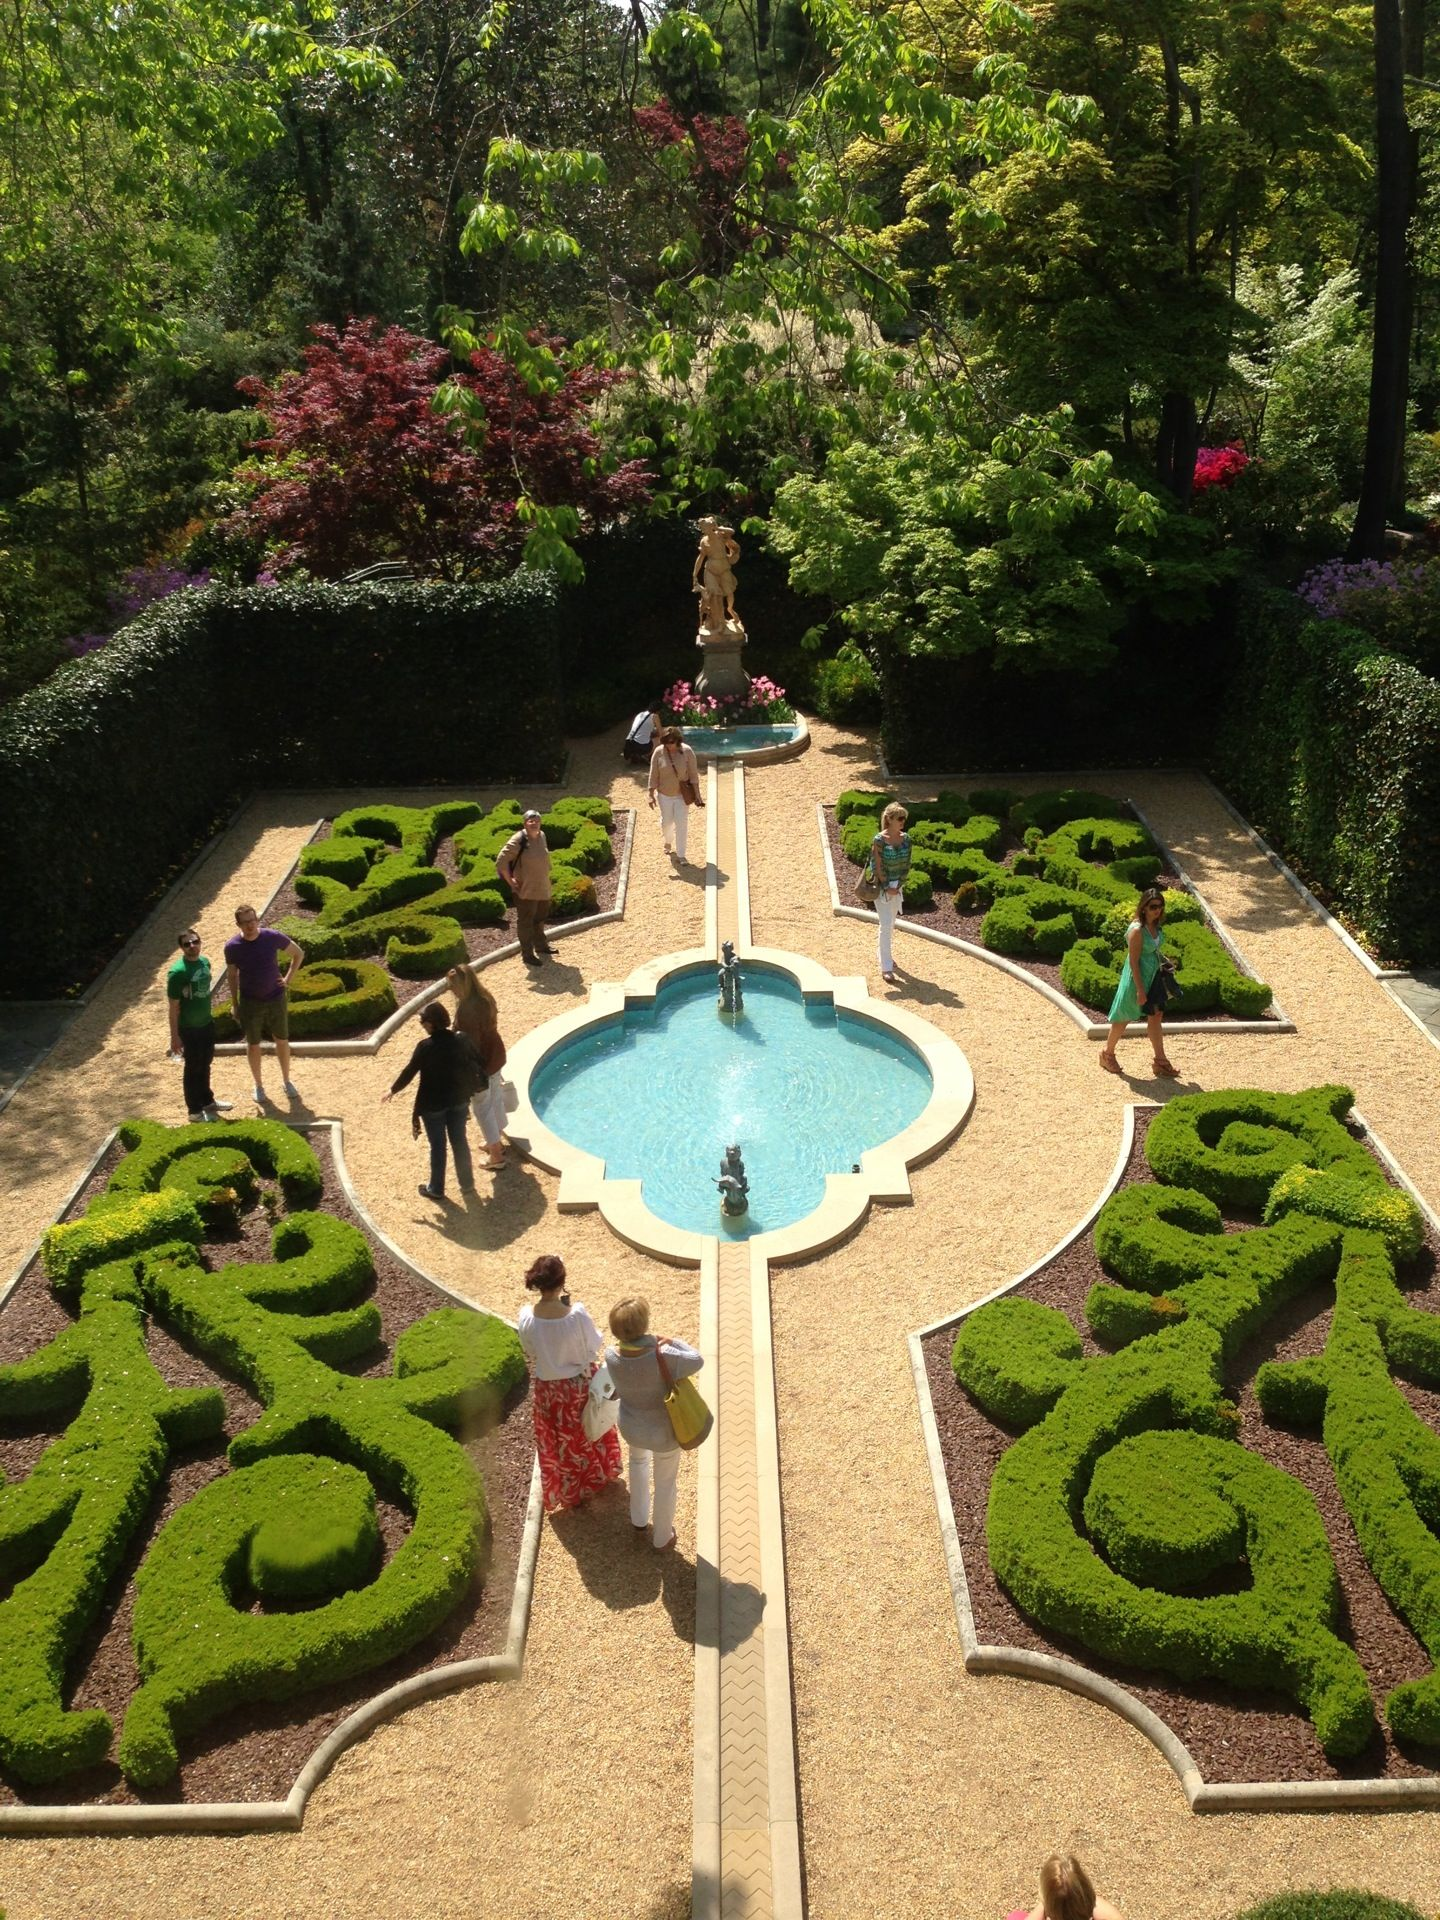 12729dca74129d0fe7e2a0727f02d2a4 - Hillwood Estate Museum & Gardens Washington Dc 20008